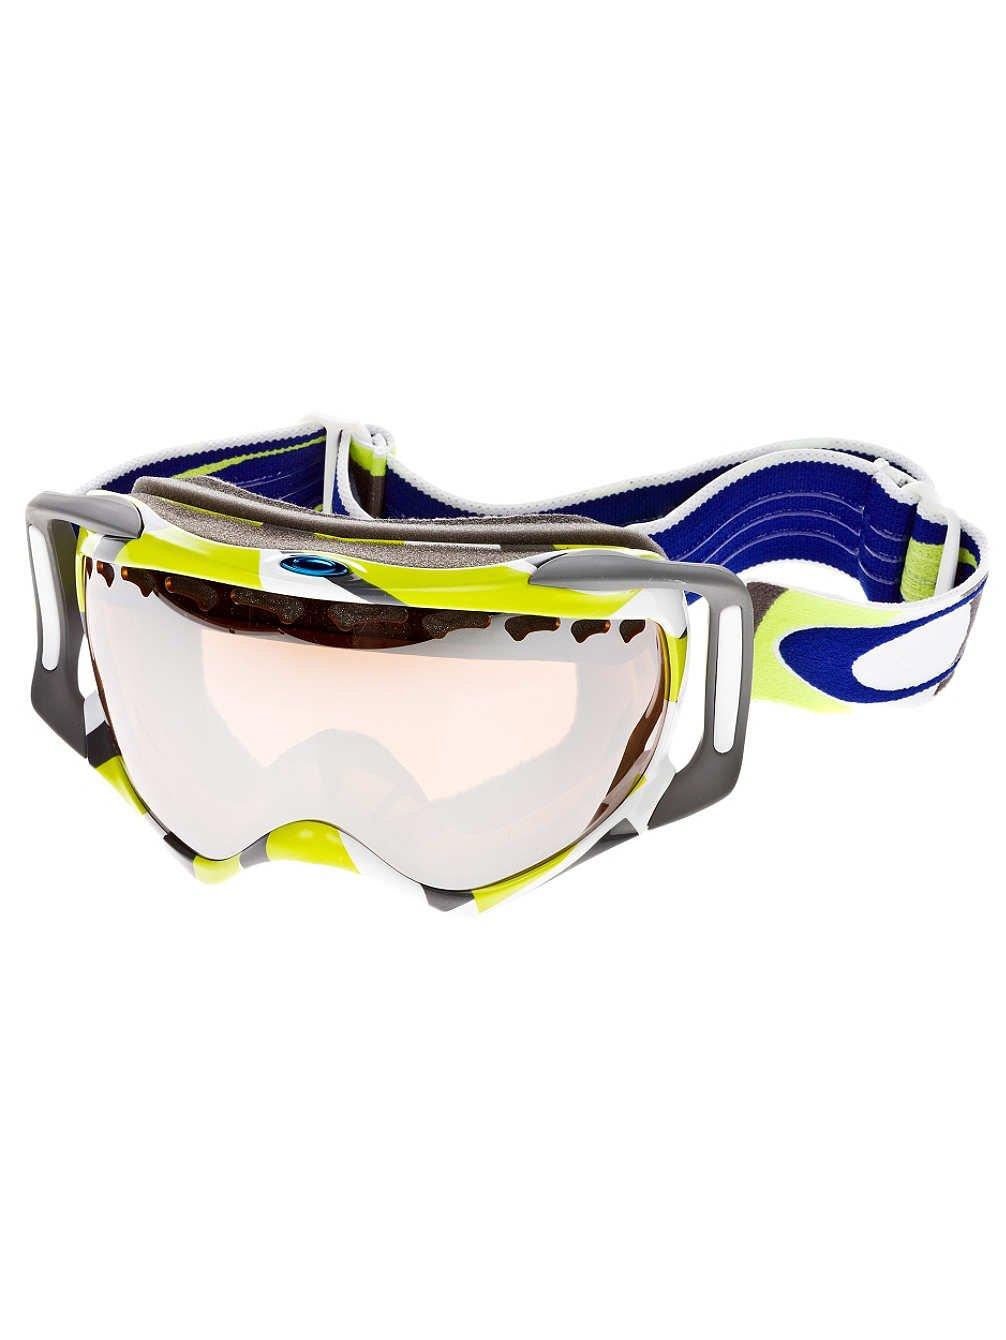 Oakley Crowbar Goggle Factory Slant 2 Green W/Blk Irid, One Size by Oakley